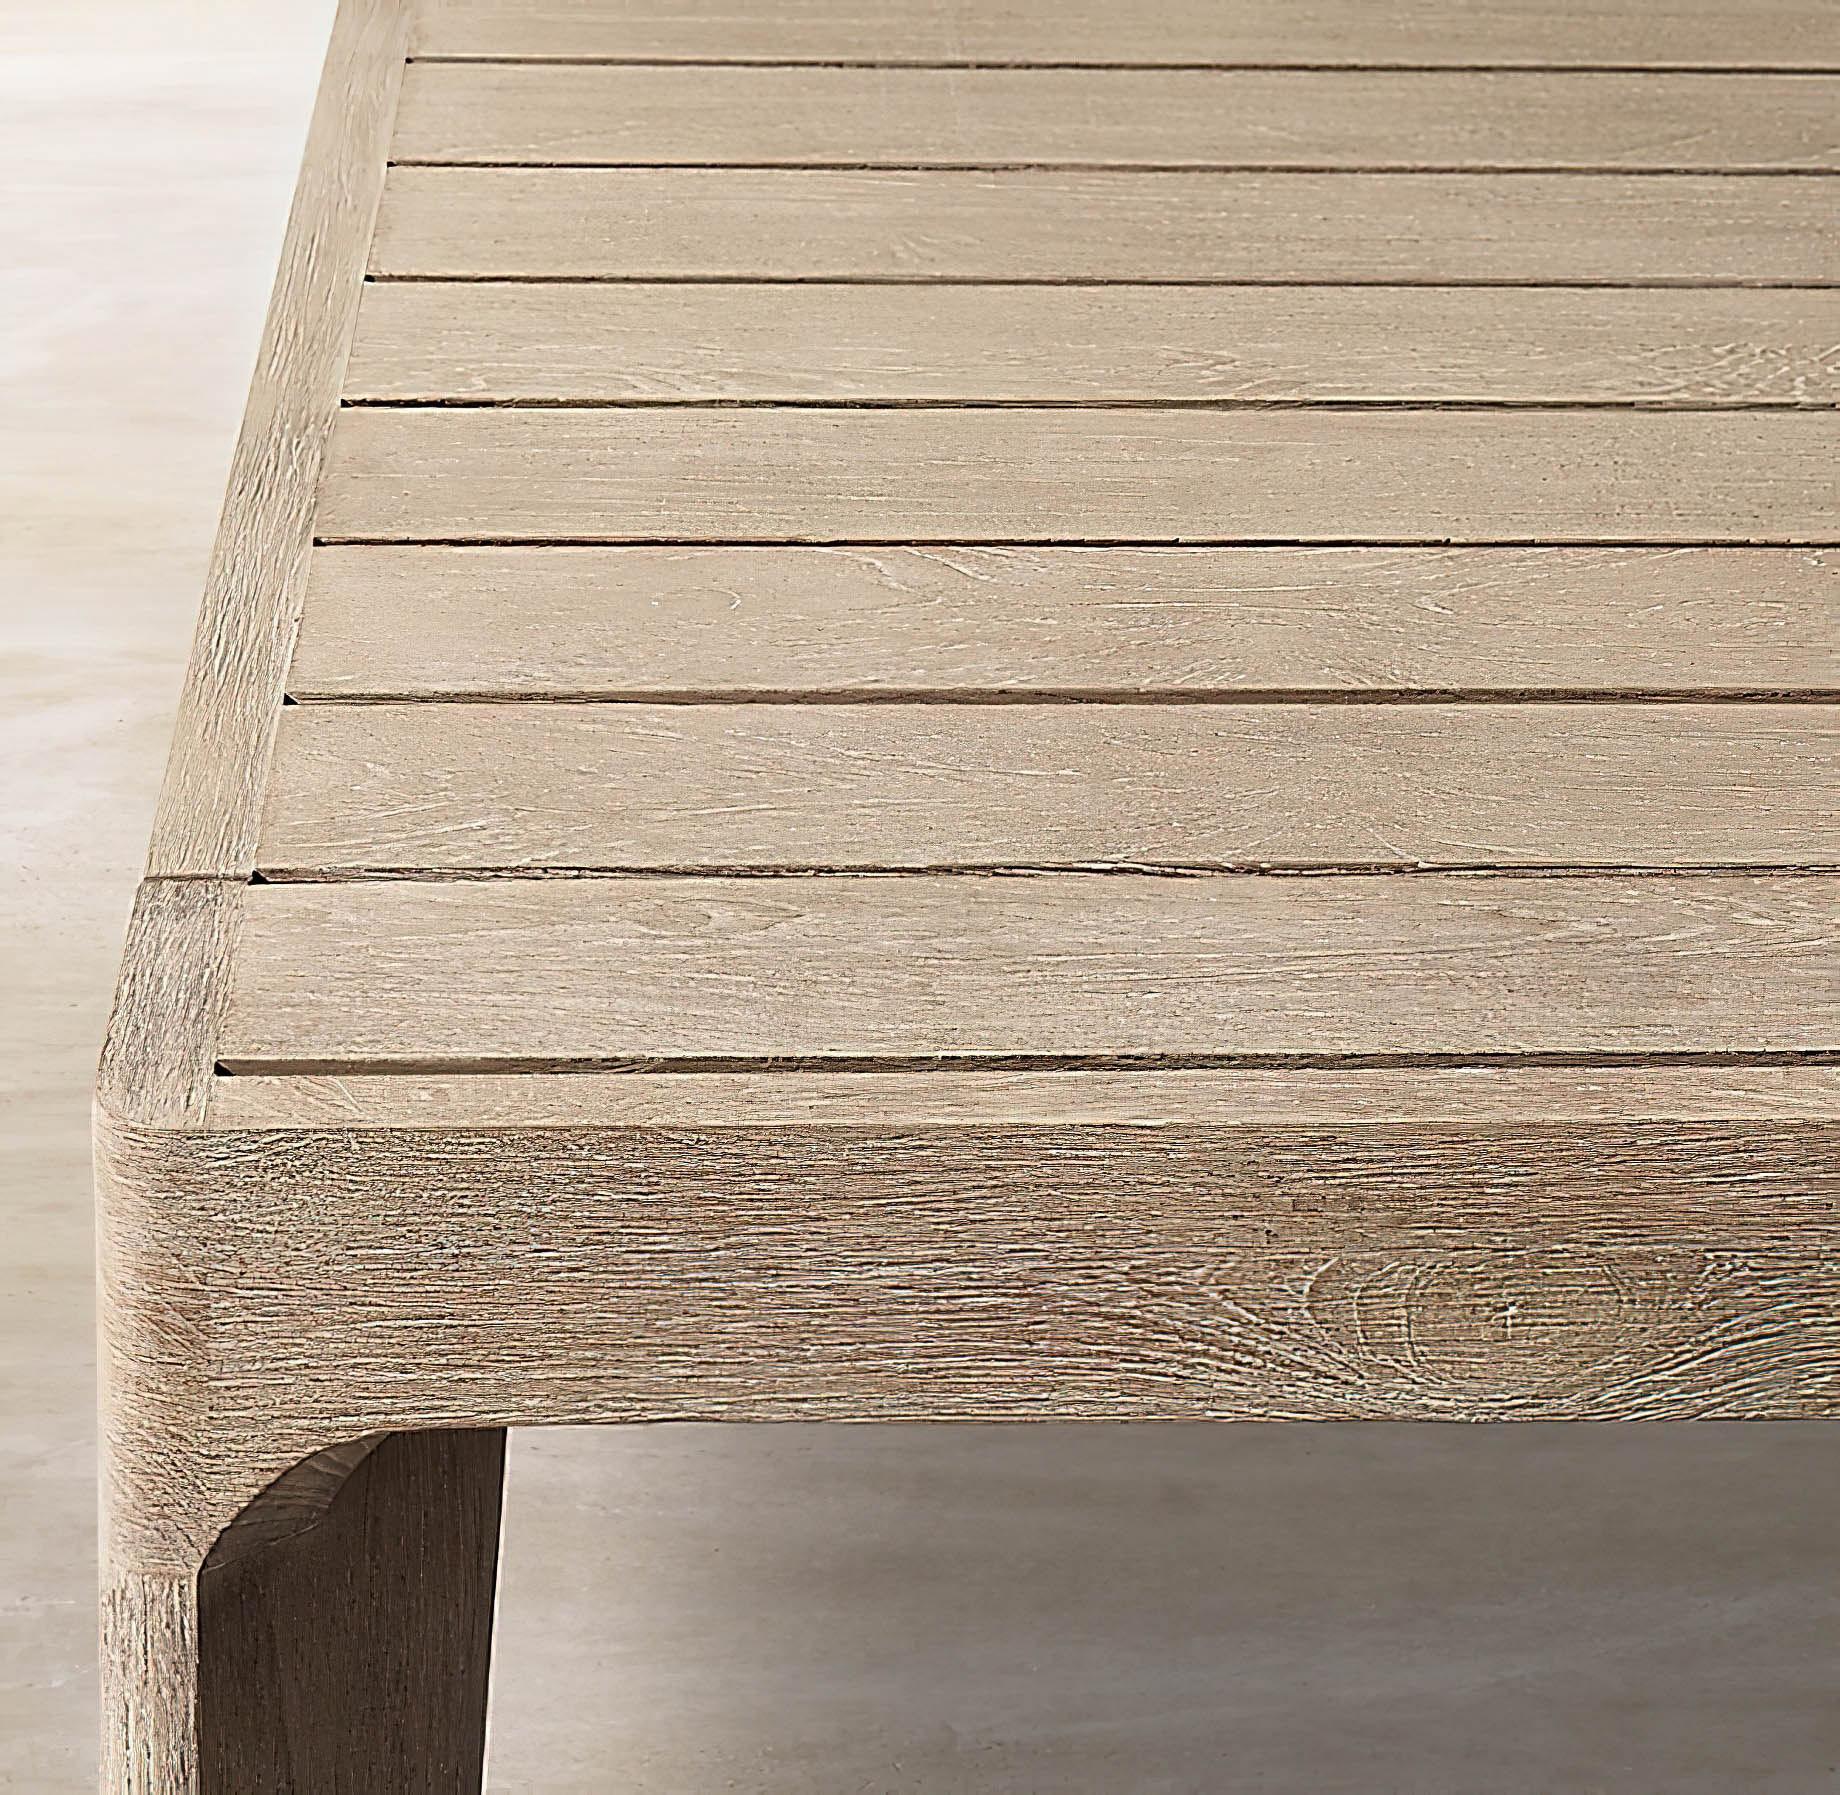 Malta Teak Collection Outdoor Furniture Design for RH – Ramon Esteve – Malta Teak Dining Table